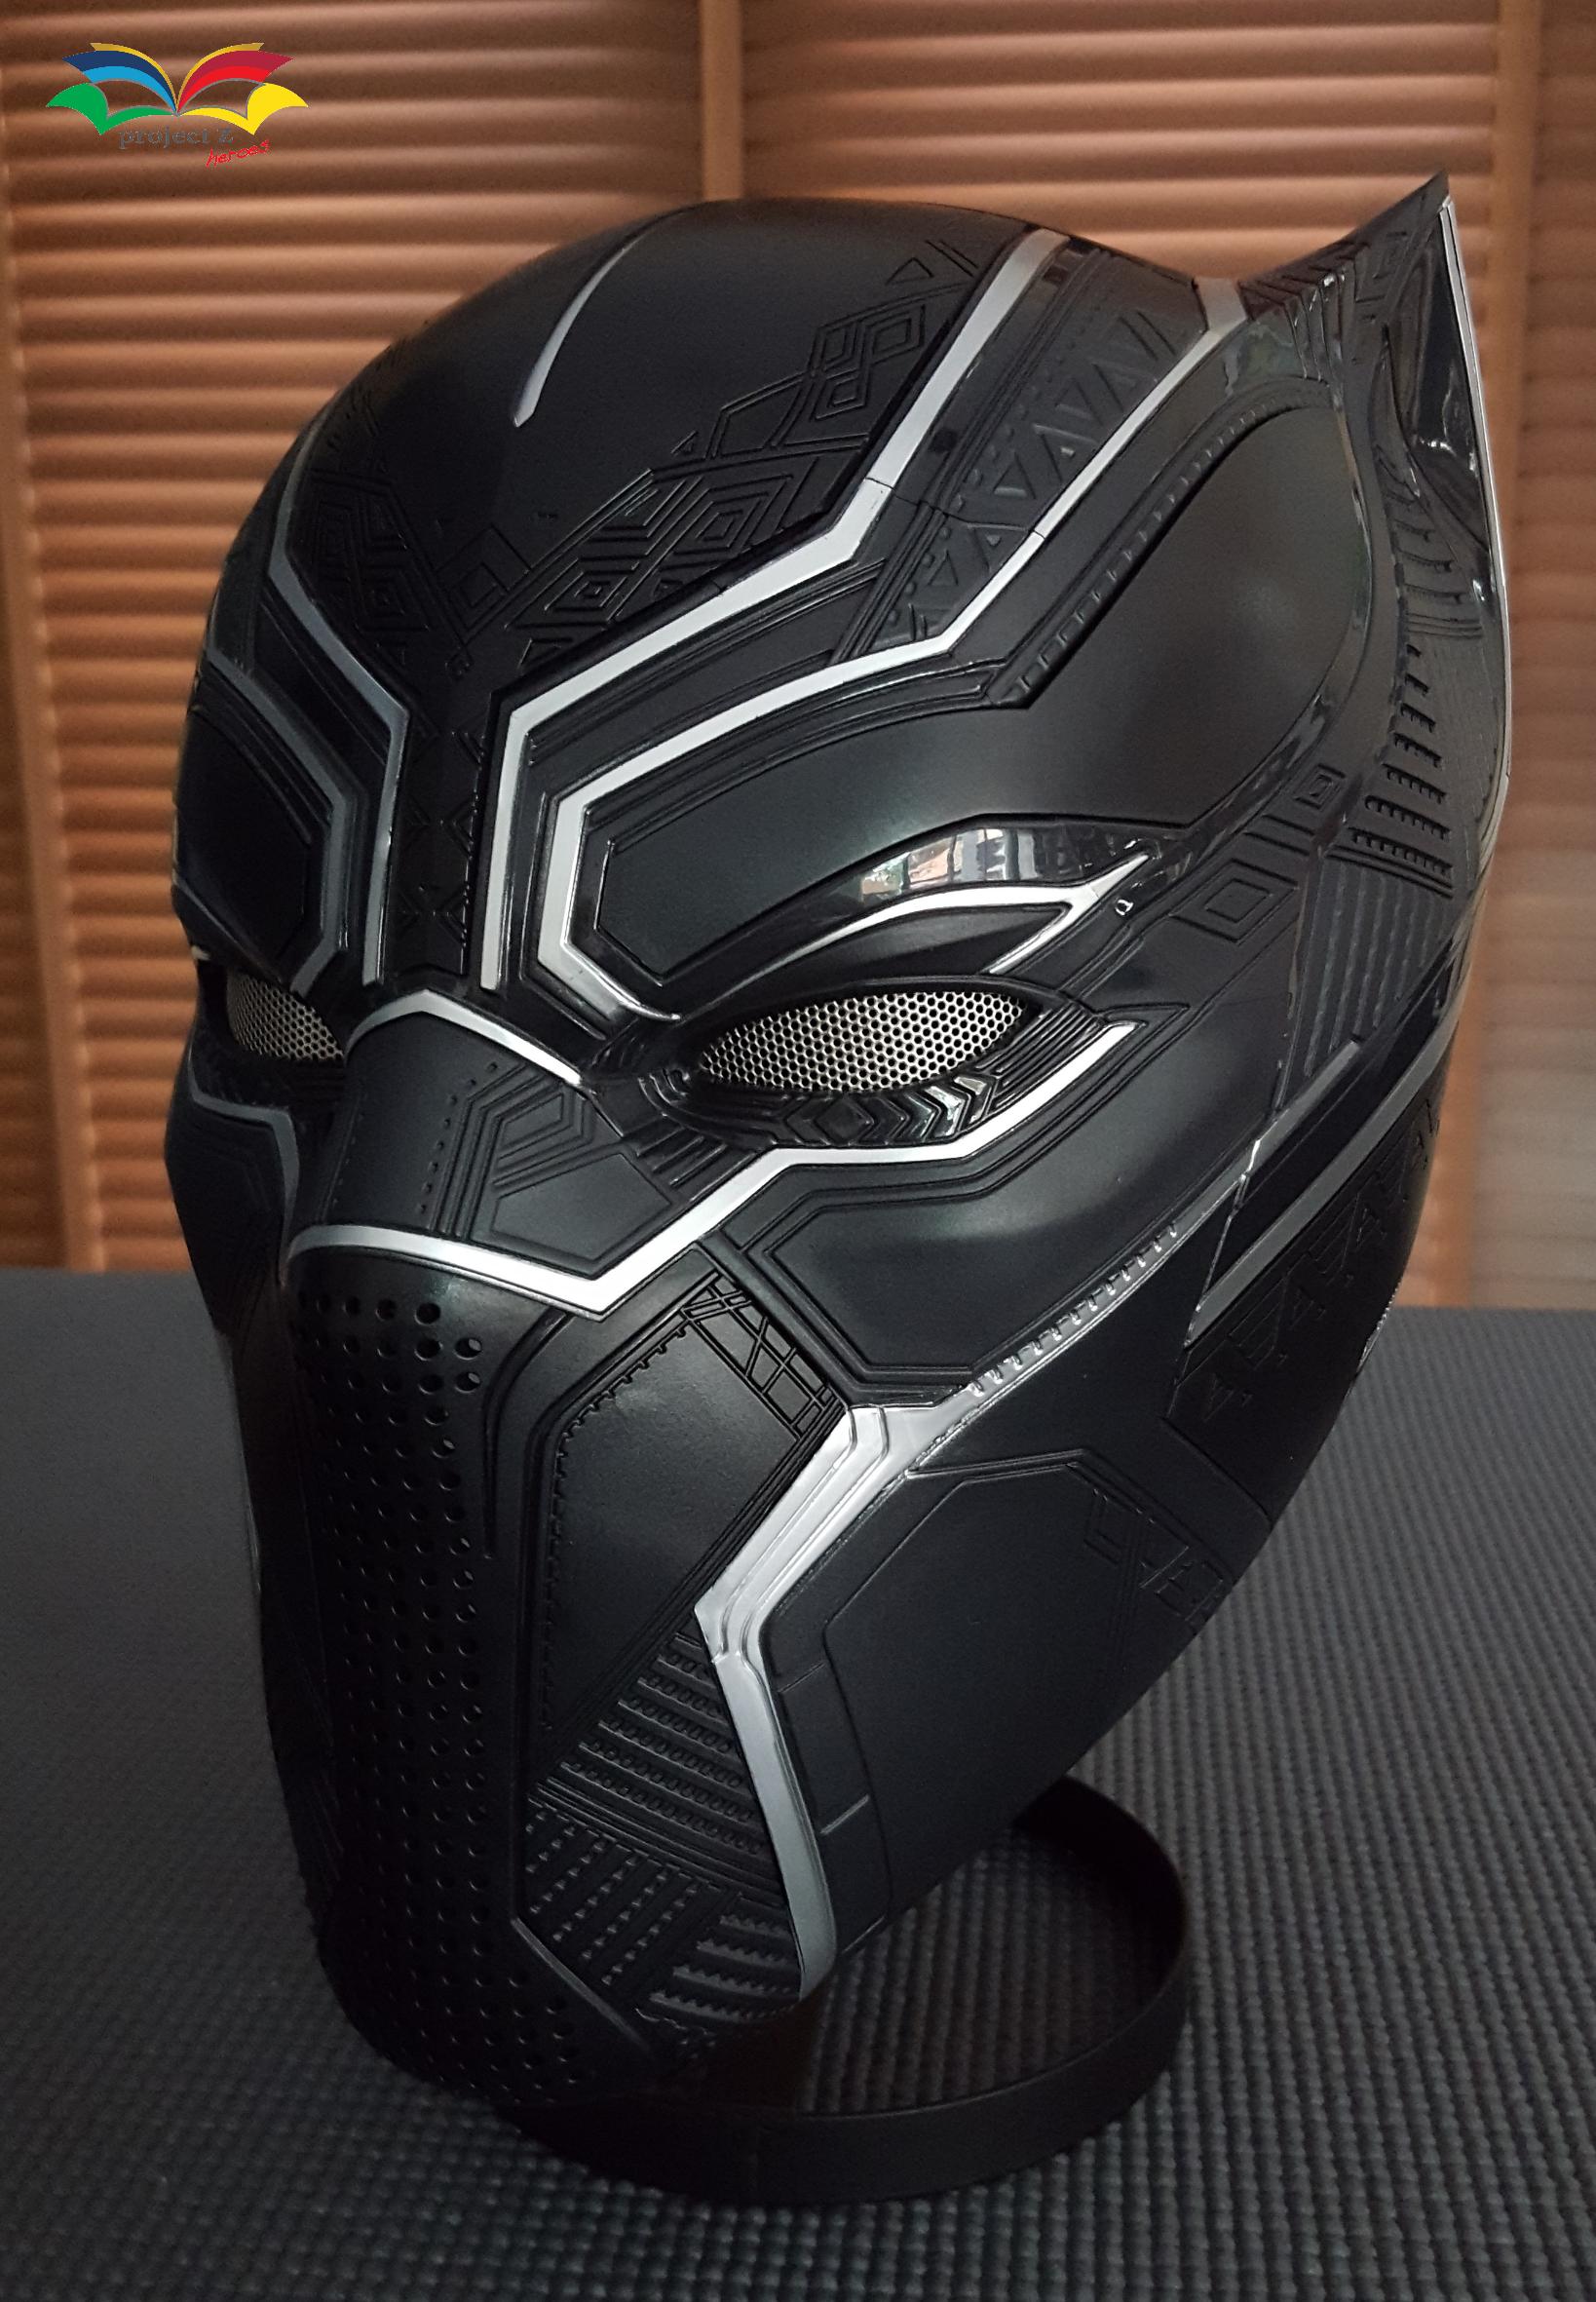 Black Panther costume helmet 1